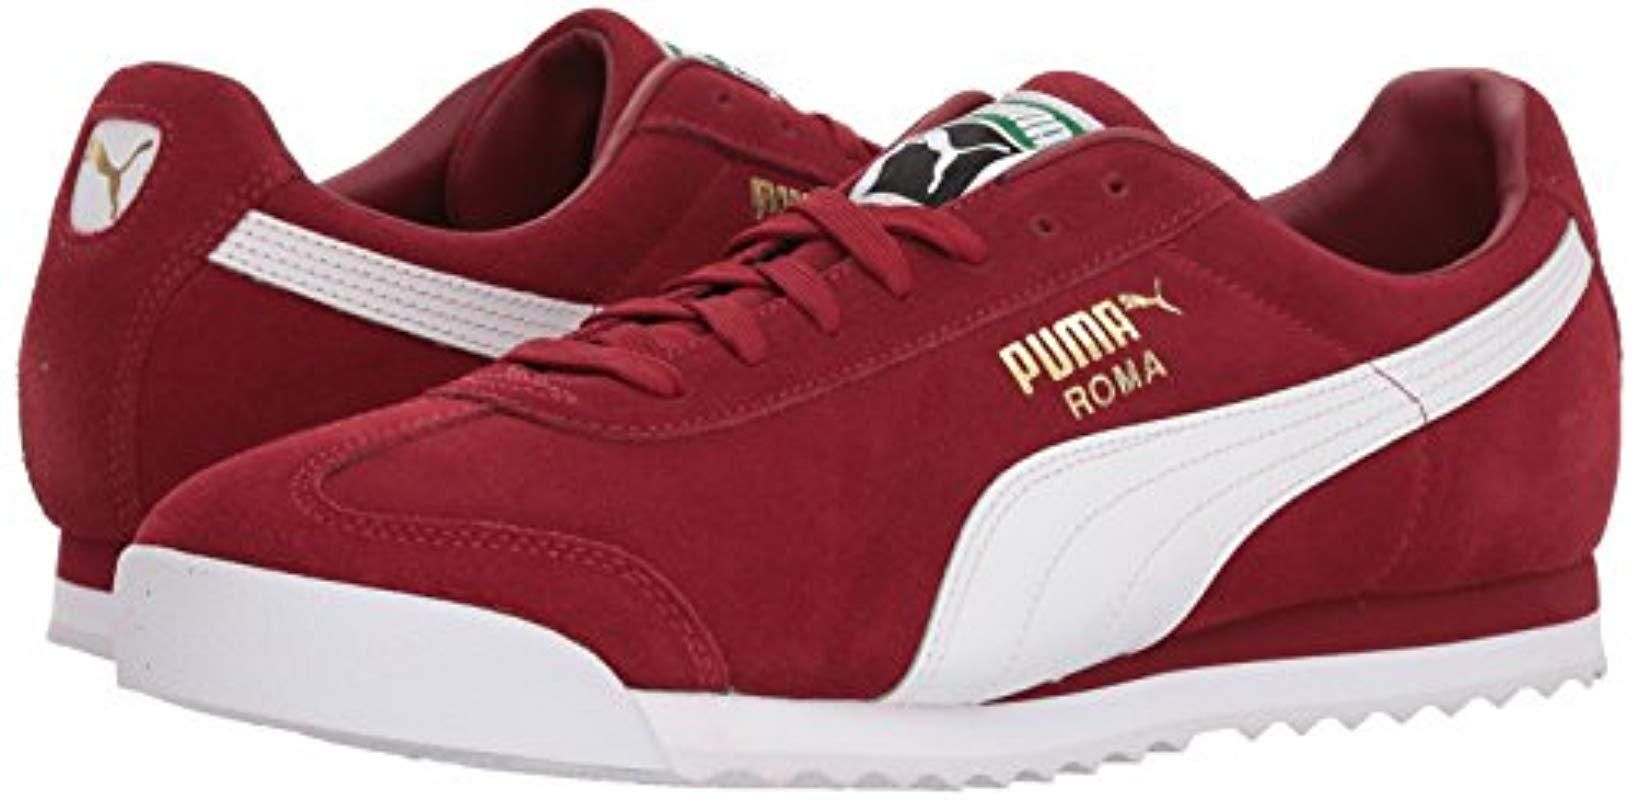 brand new 53401 e695b Men's Red Roma Suede Fashion Sneaker